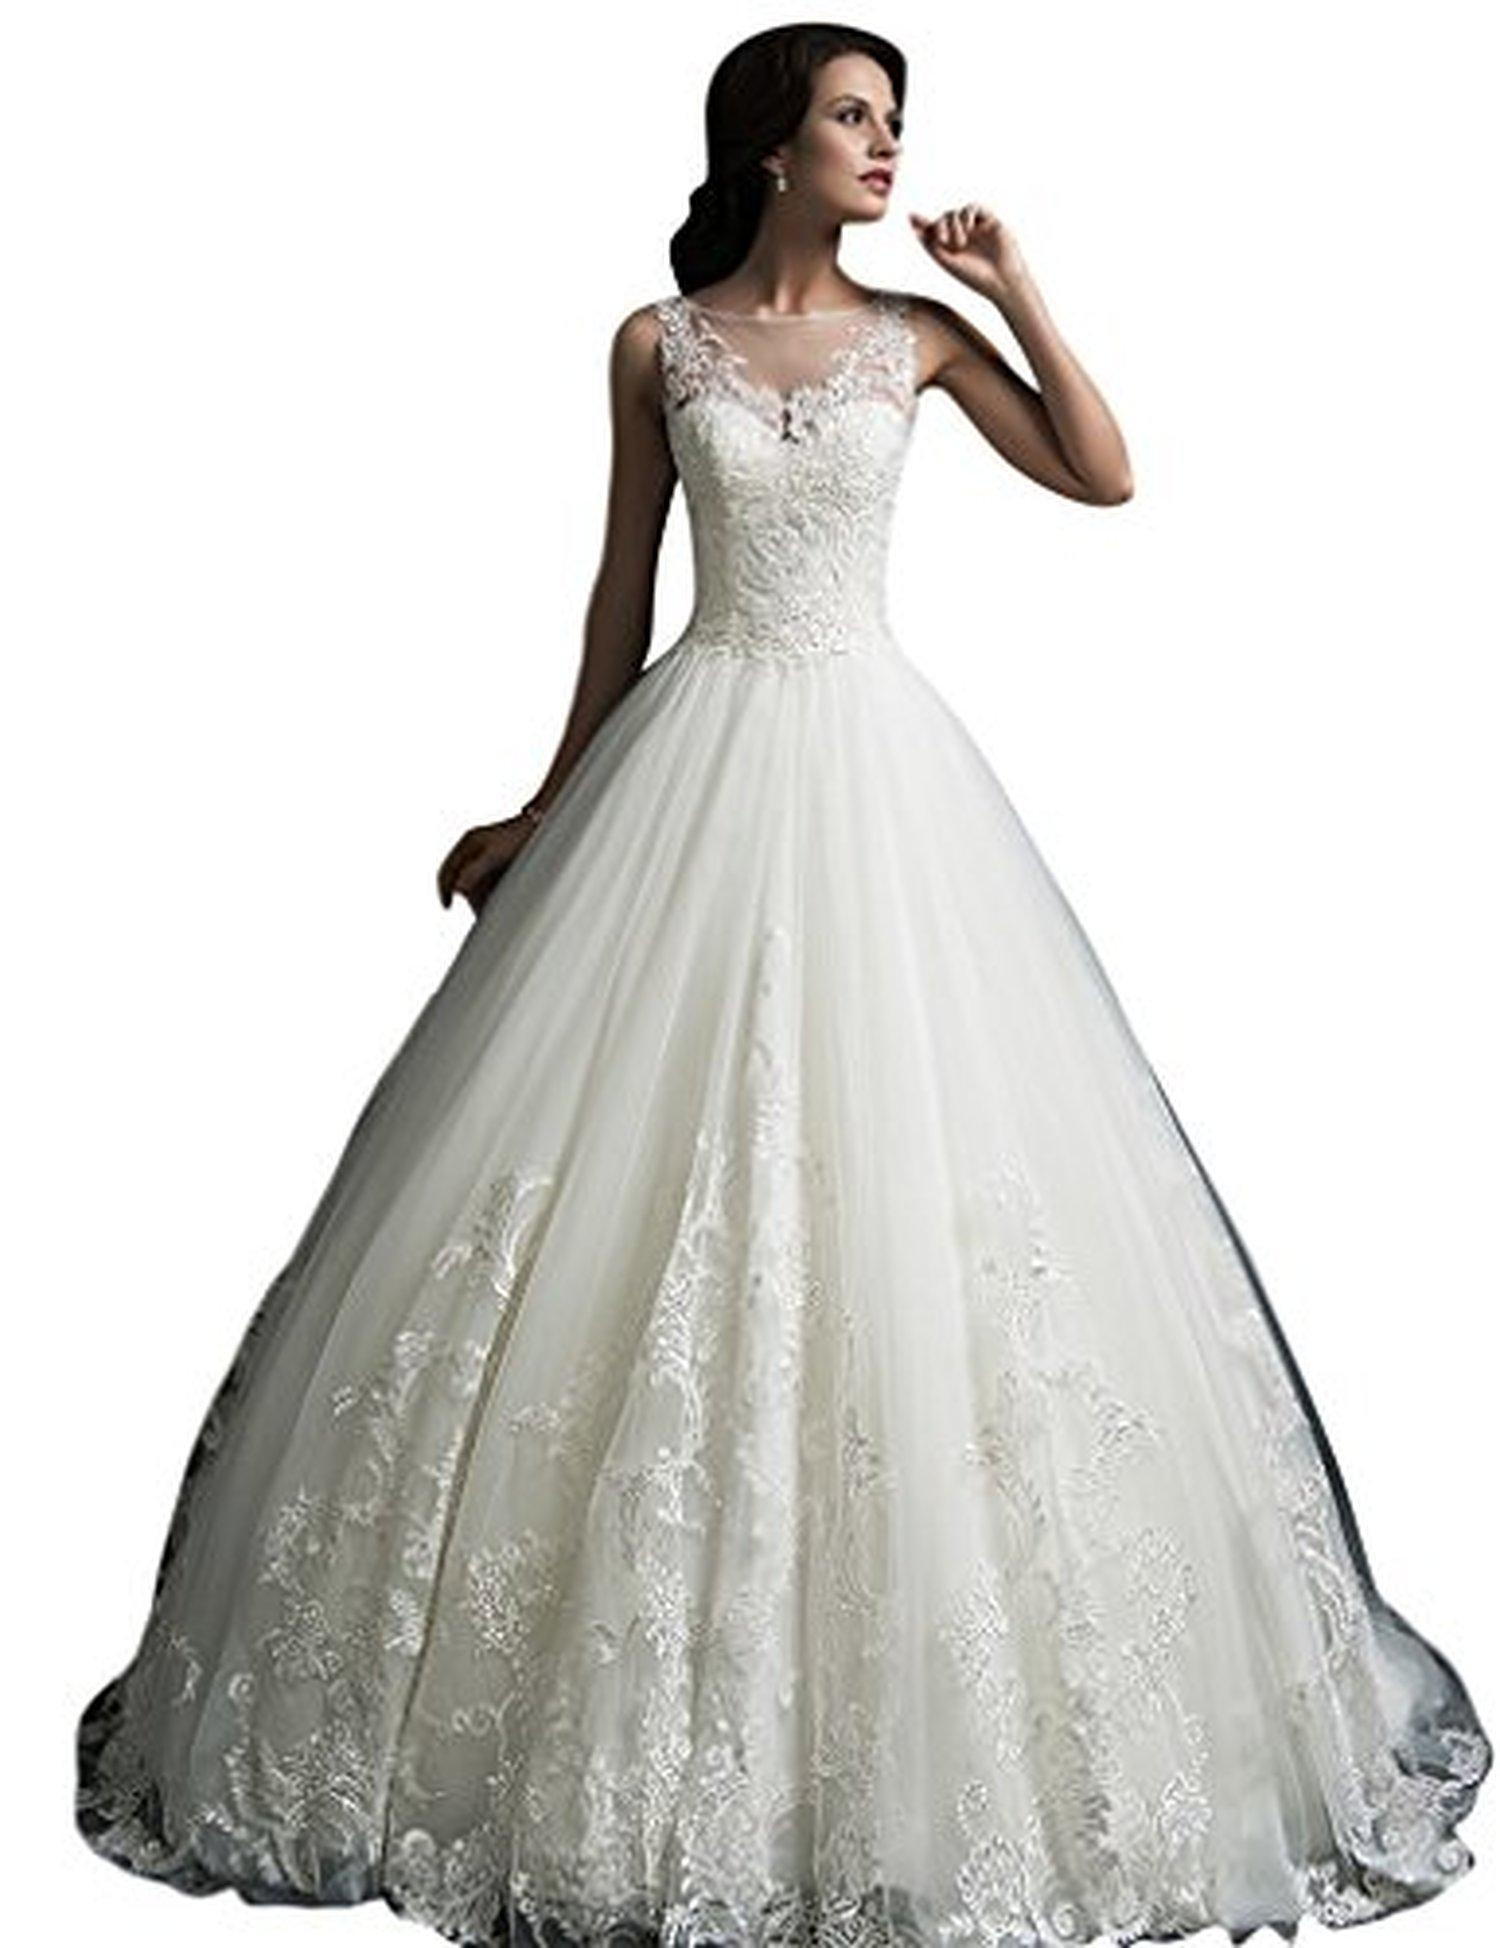 JoyVany Vintage Lace Princess Wedding Dress 2016 Long Ball Gown Bridal Dress Ivory Size 6